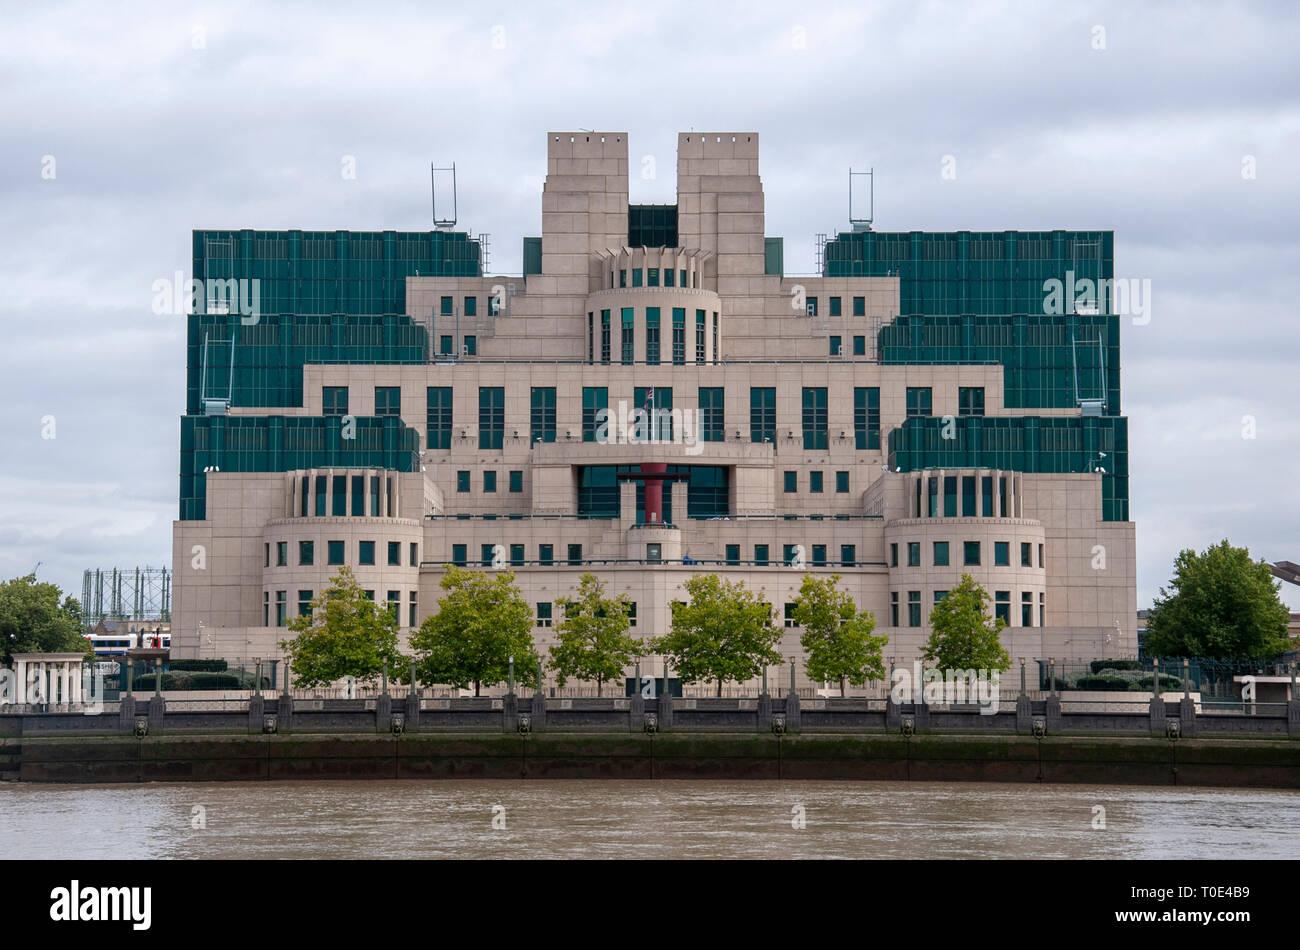 The Secret Intelligence Service Building in Millbank London UK - Stock Image